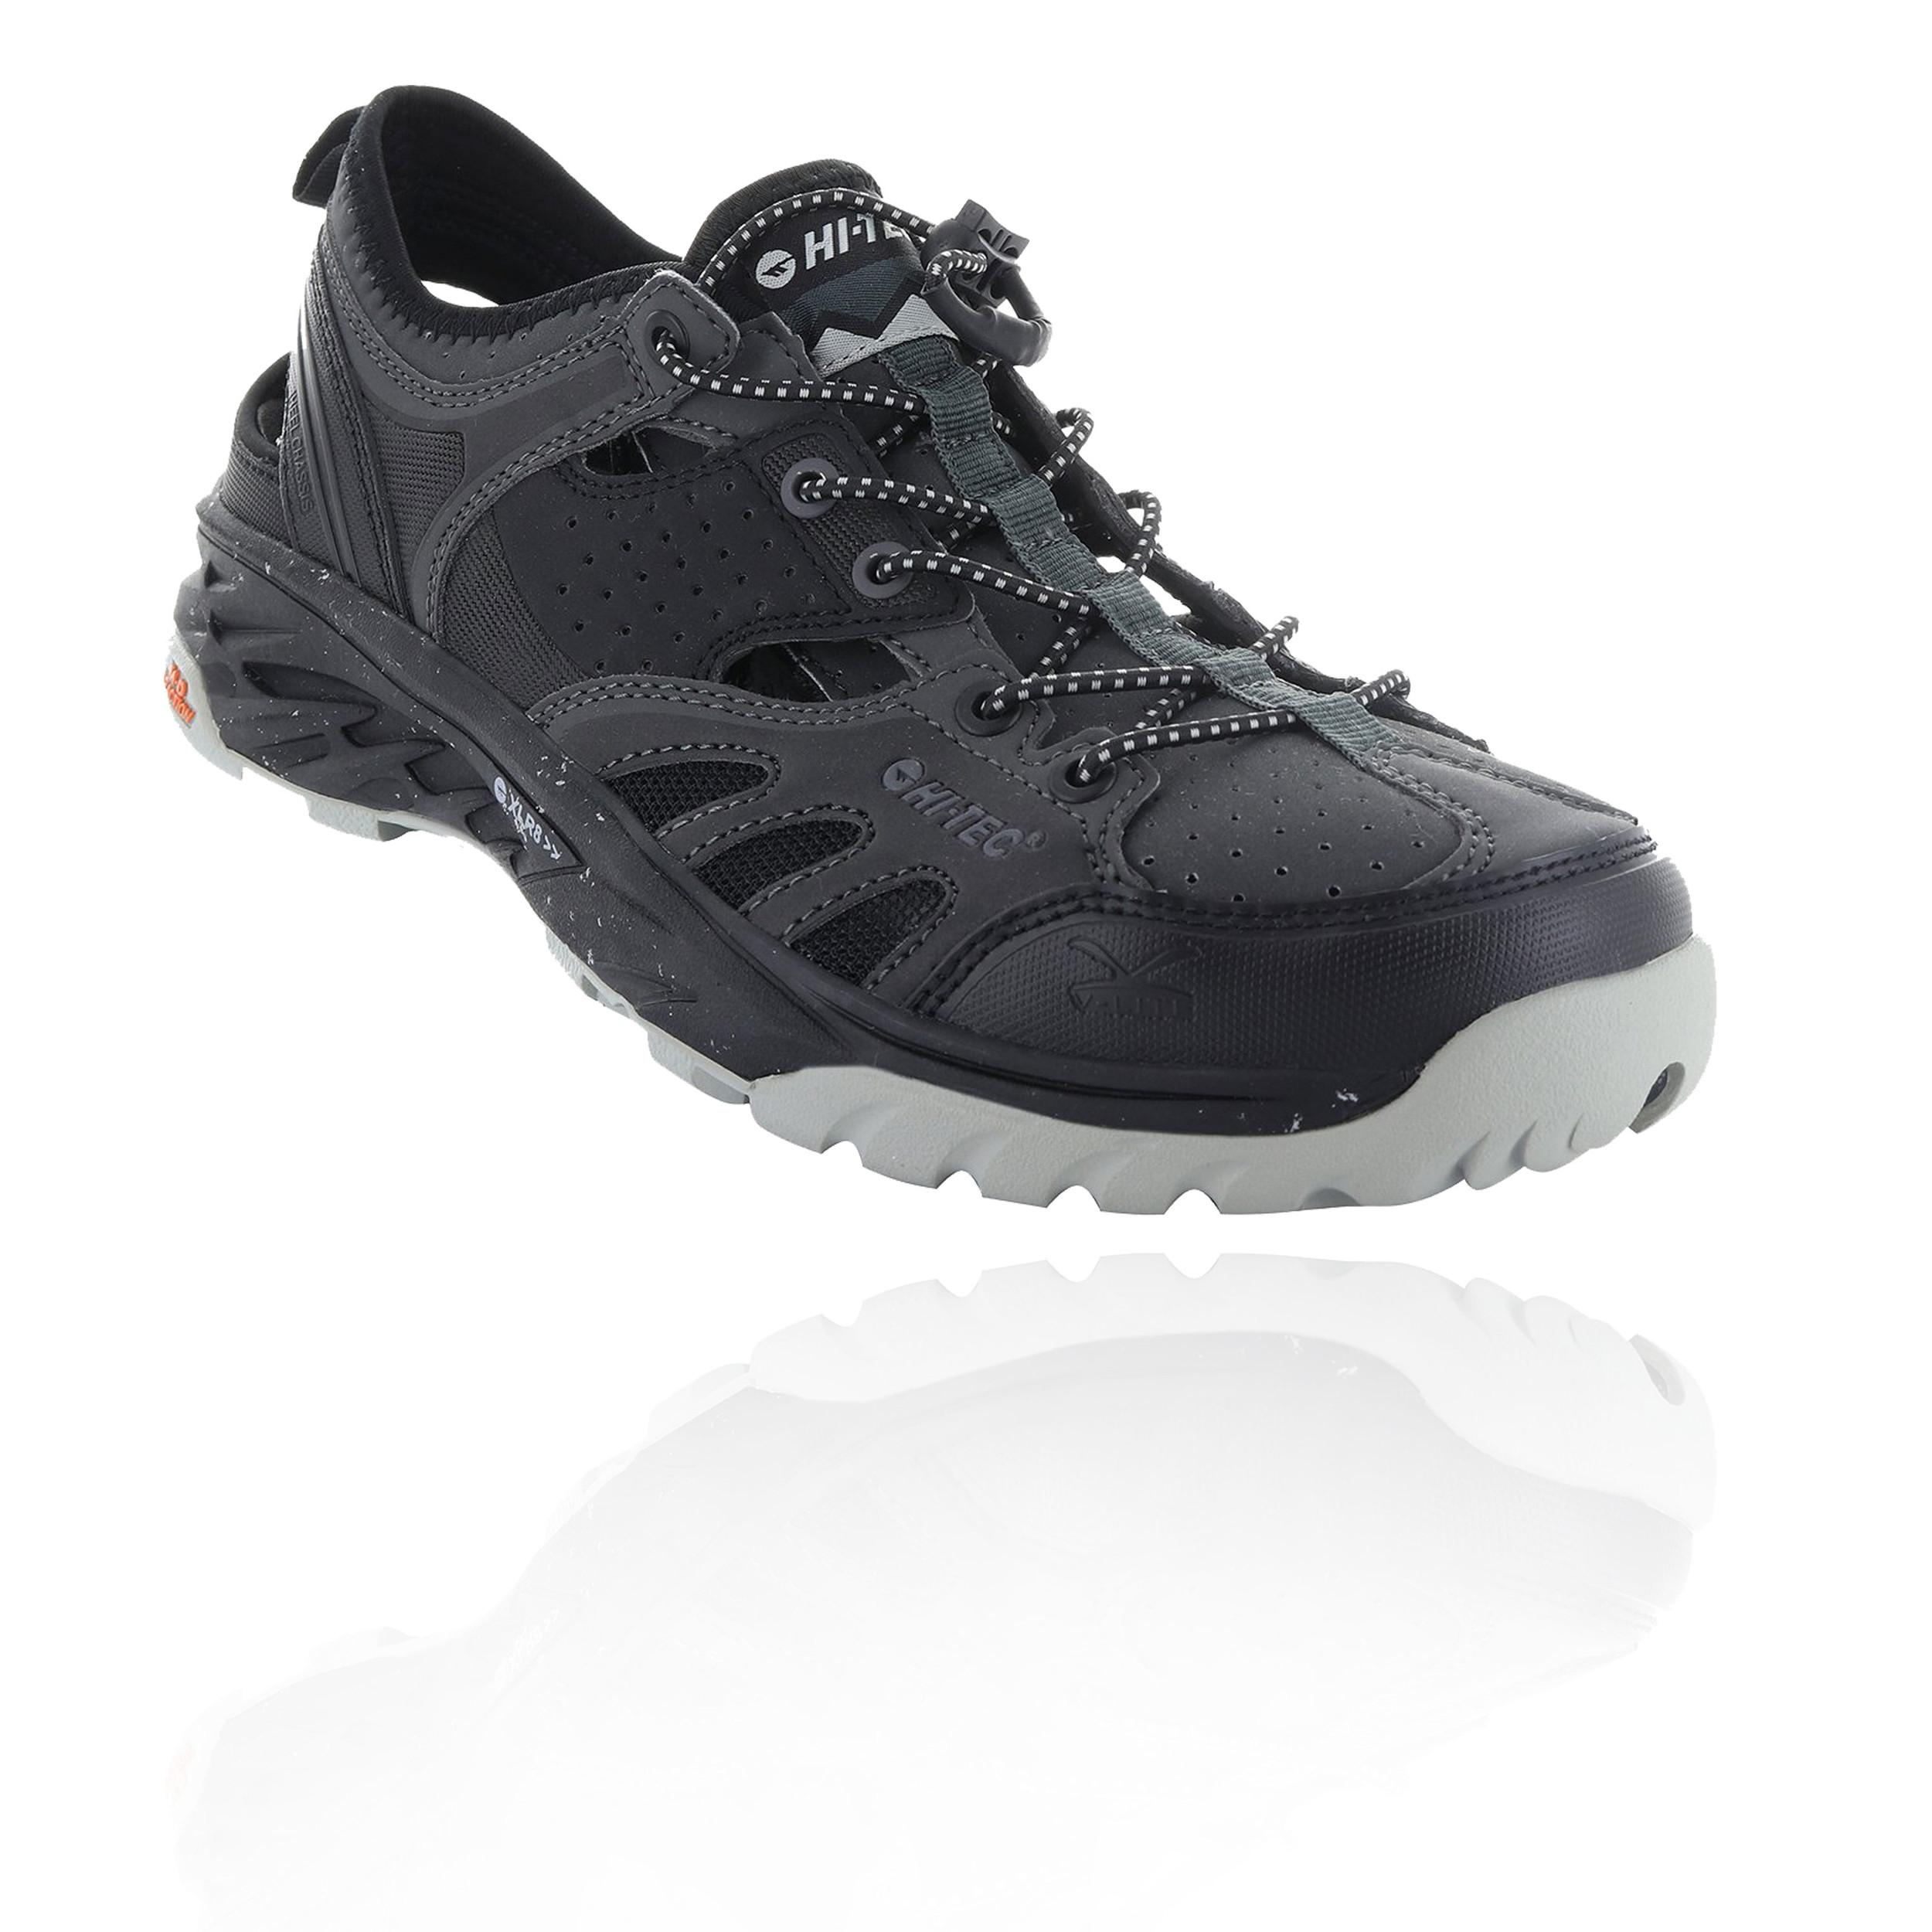 52f583ed07f Details about Hi-Tec Mens V-Lite Wild-Life Cayman Walking Shoes Black  Sports Outdoors